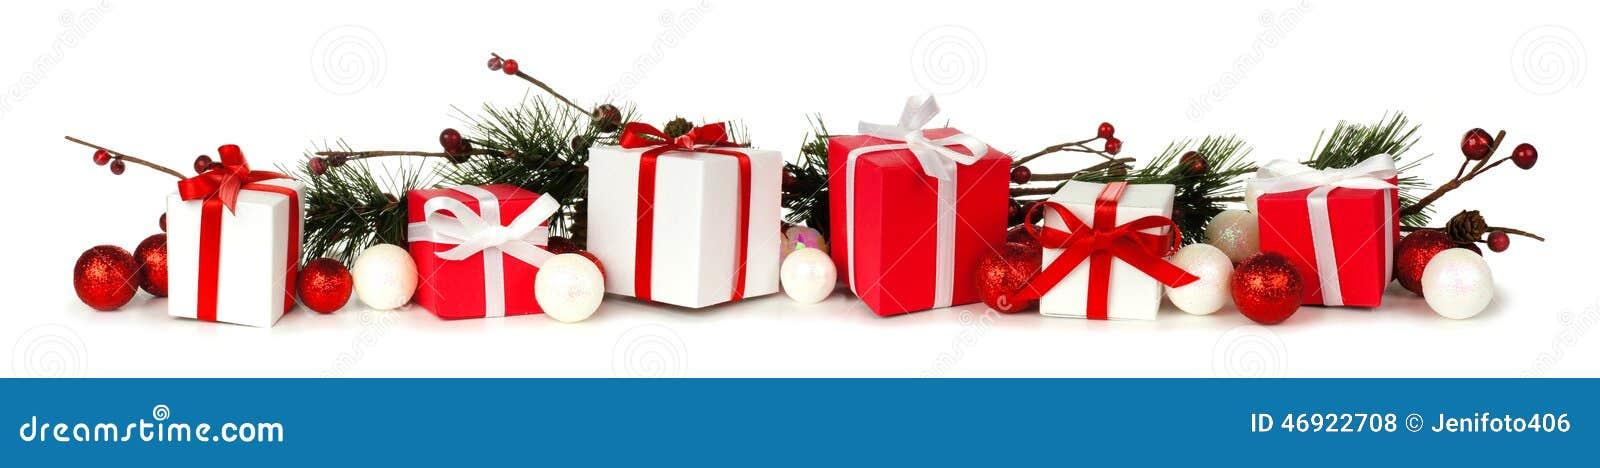 Christmas Toys Border : Christmas branches and gift border stock photo image of